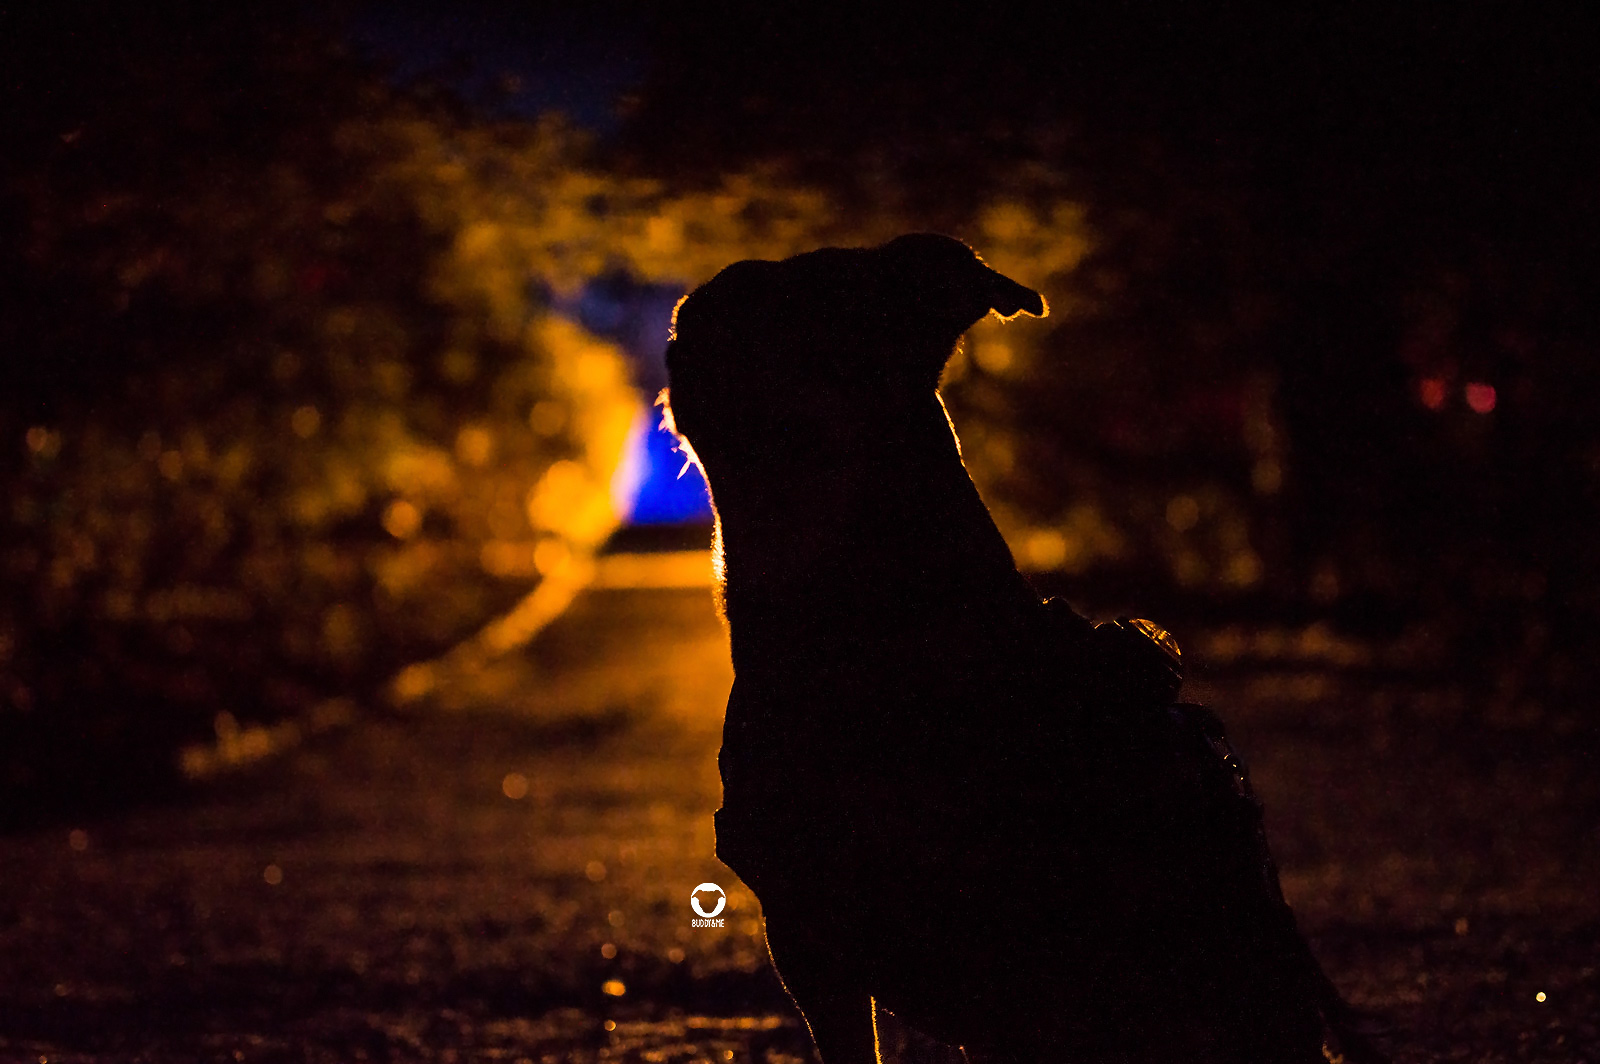 Pinscher Buddy, Buddy and Me, Hundeblog, Dogblog, Ruhrgebiet, Leben mit Hund, Hundealltag, Gruga Park, Parkleuchten 2020 mit Hund